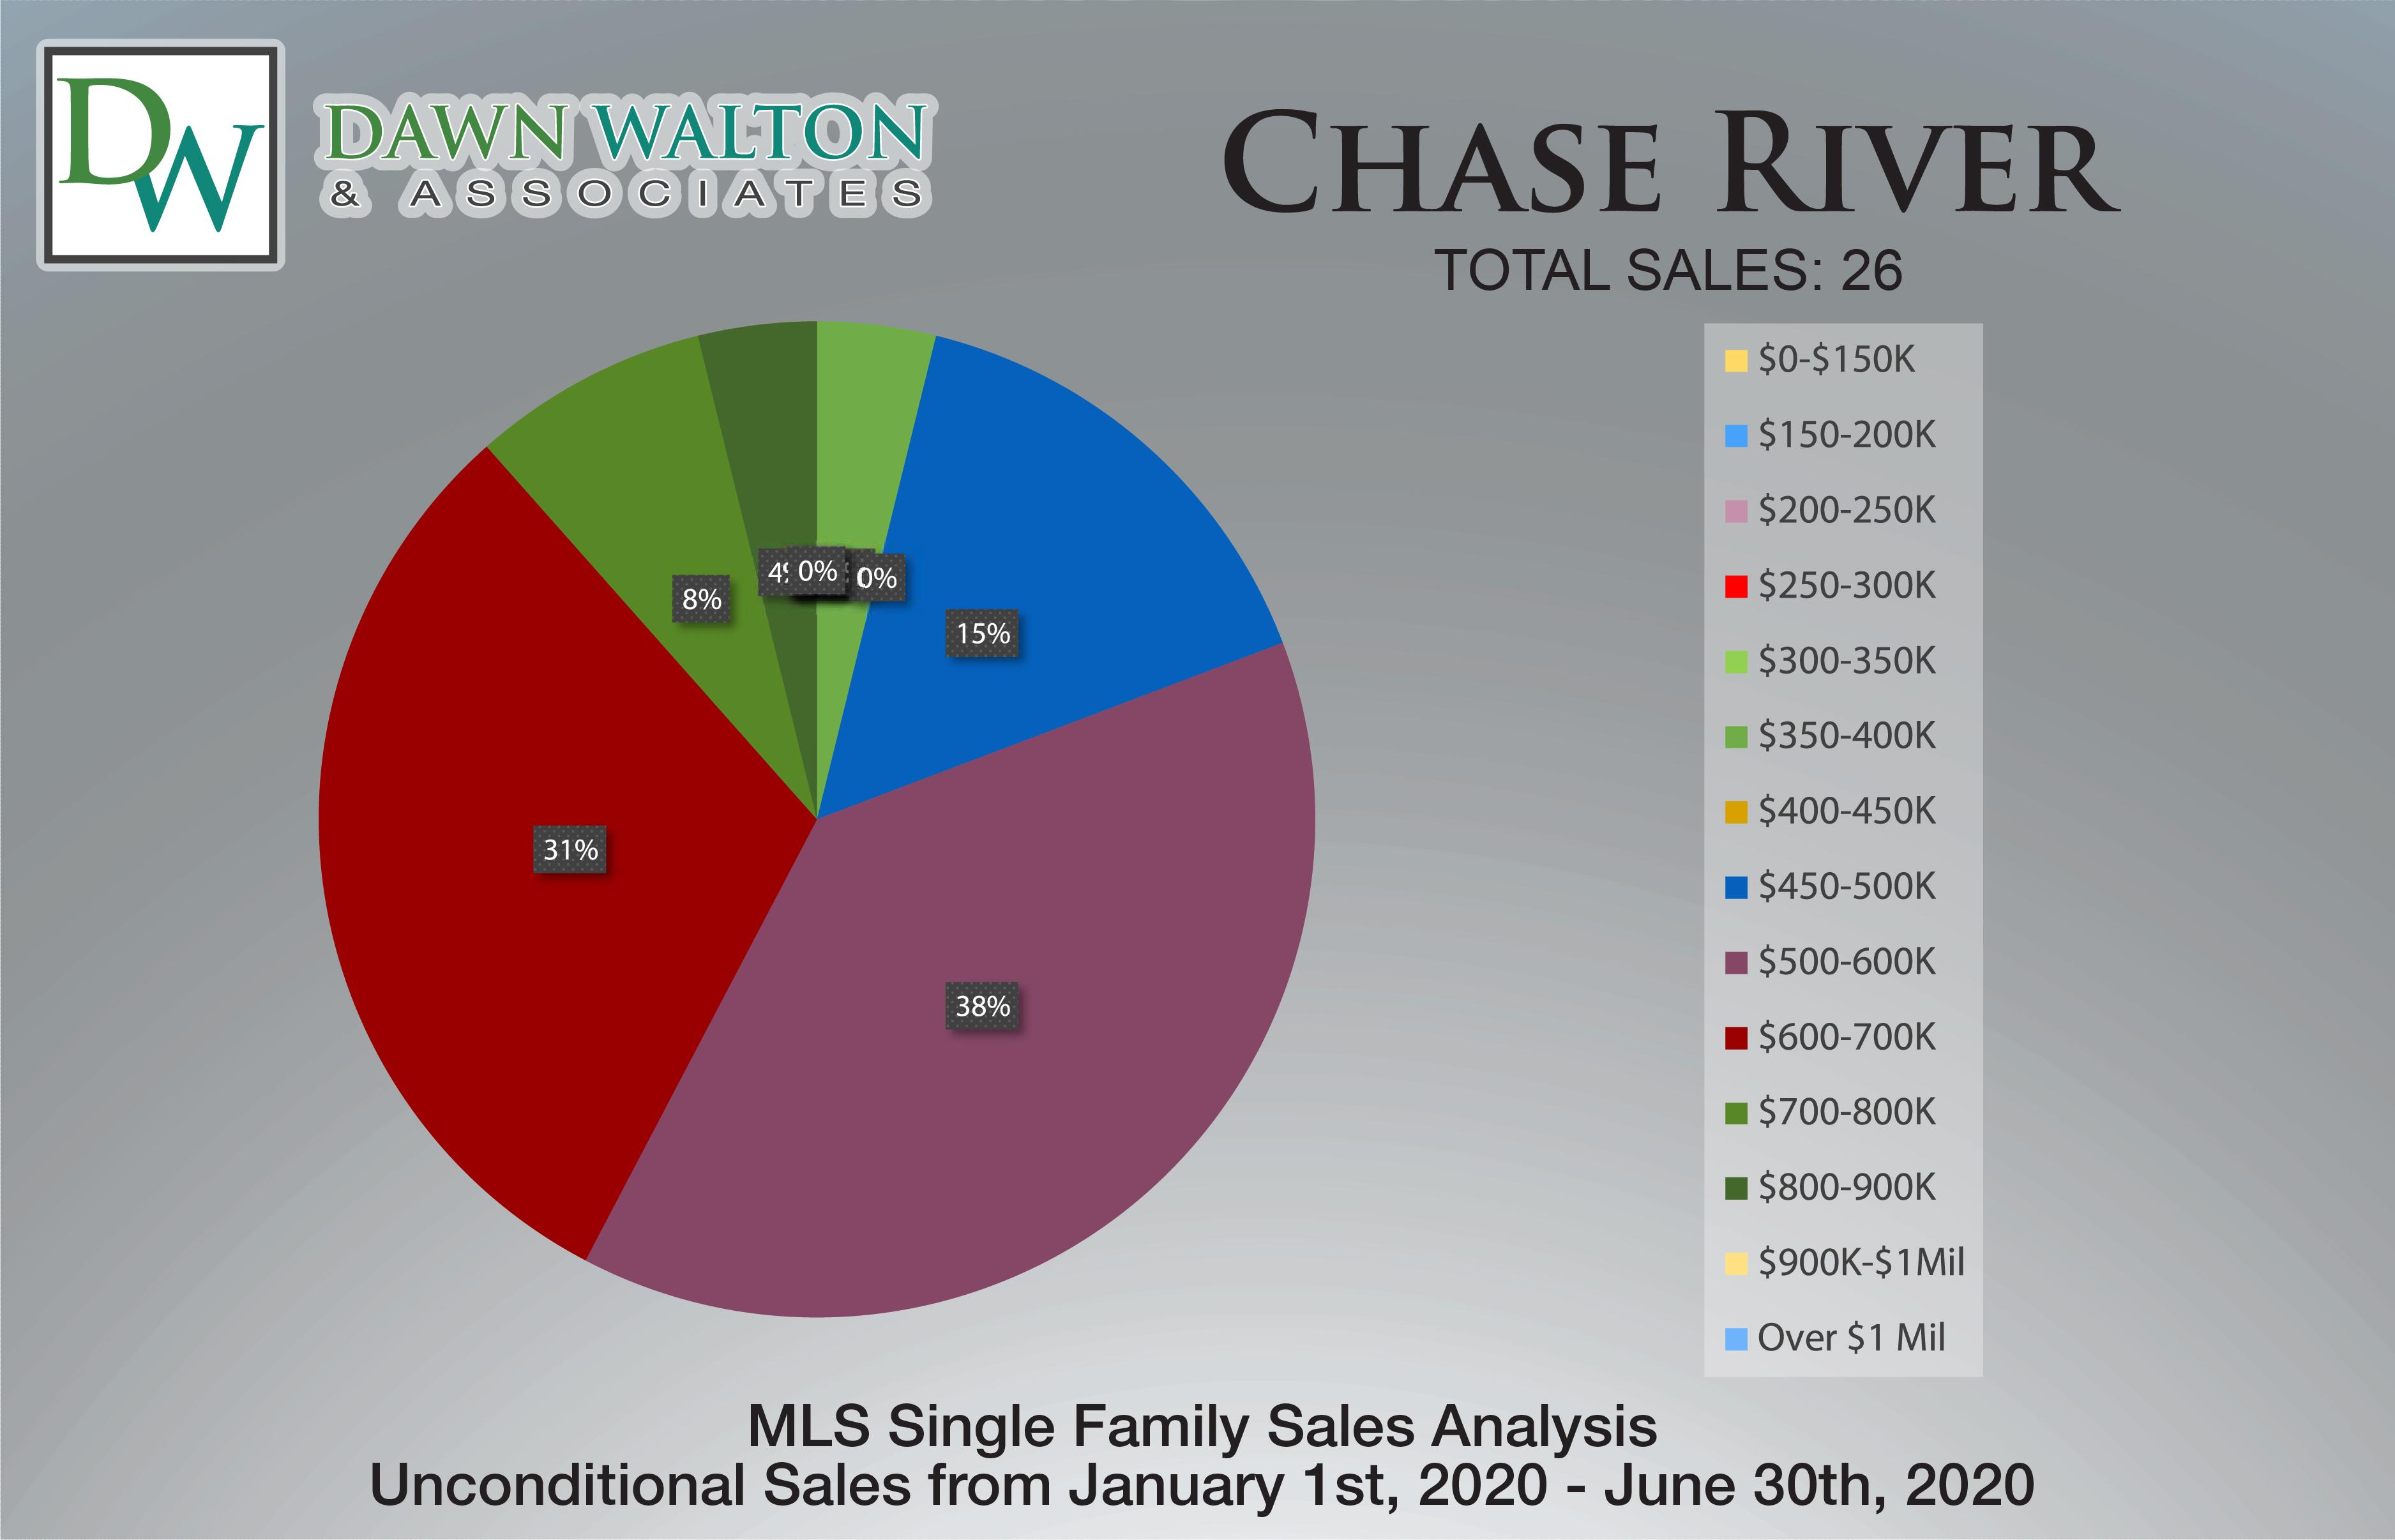 Chase River Real Estate Market Stats Price Percentage Jan 1- June 30th  2020 - Nanaimo Realtor Dawn Walton